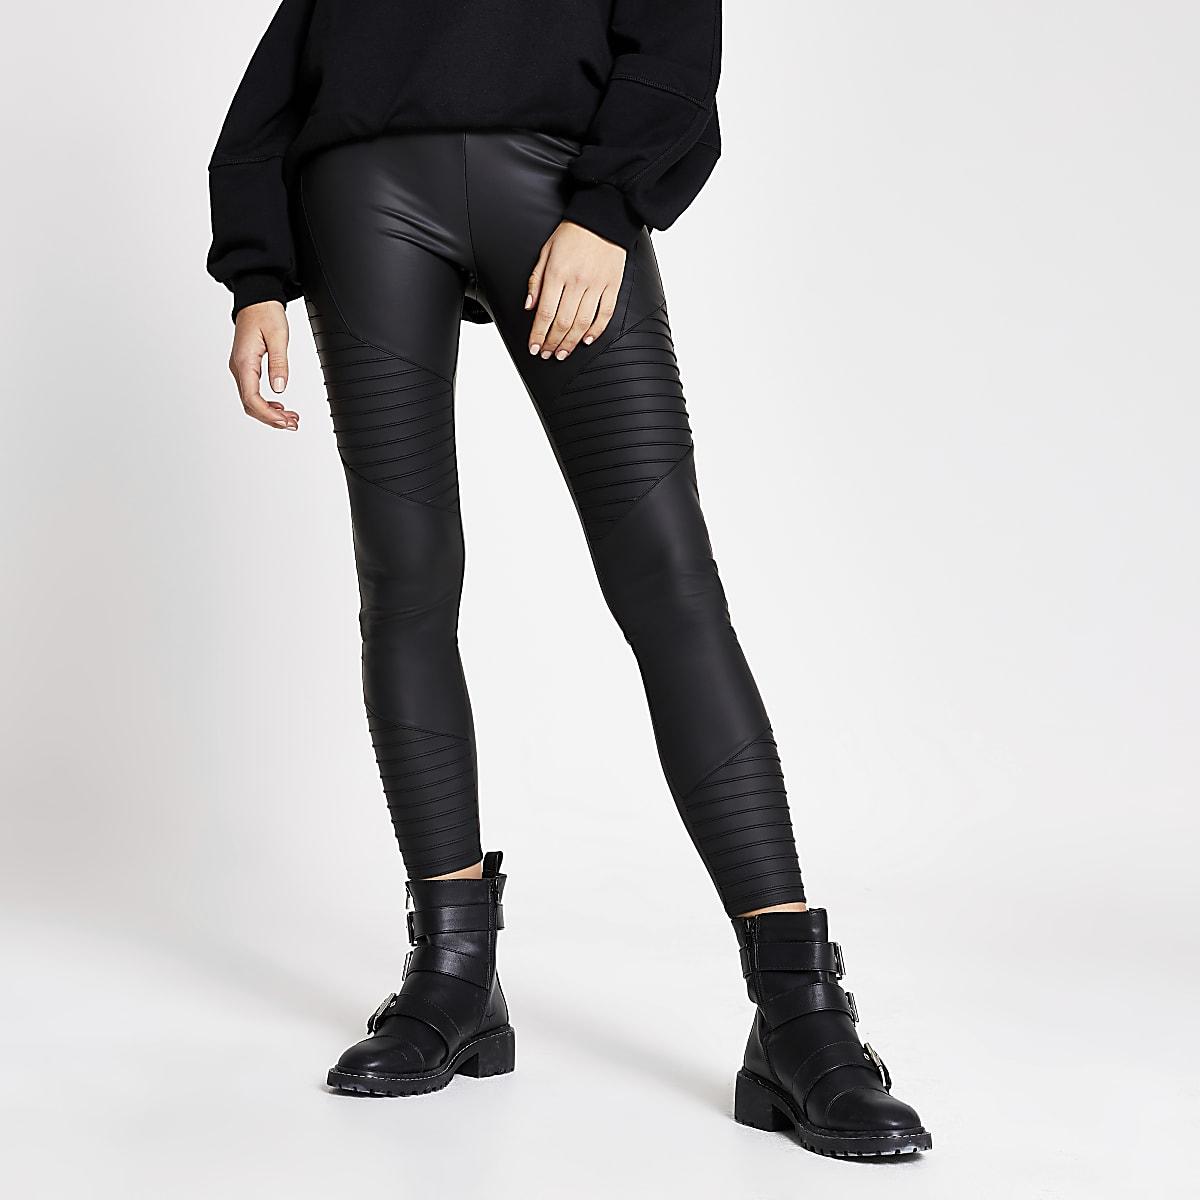 Black matte coated biker leggings